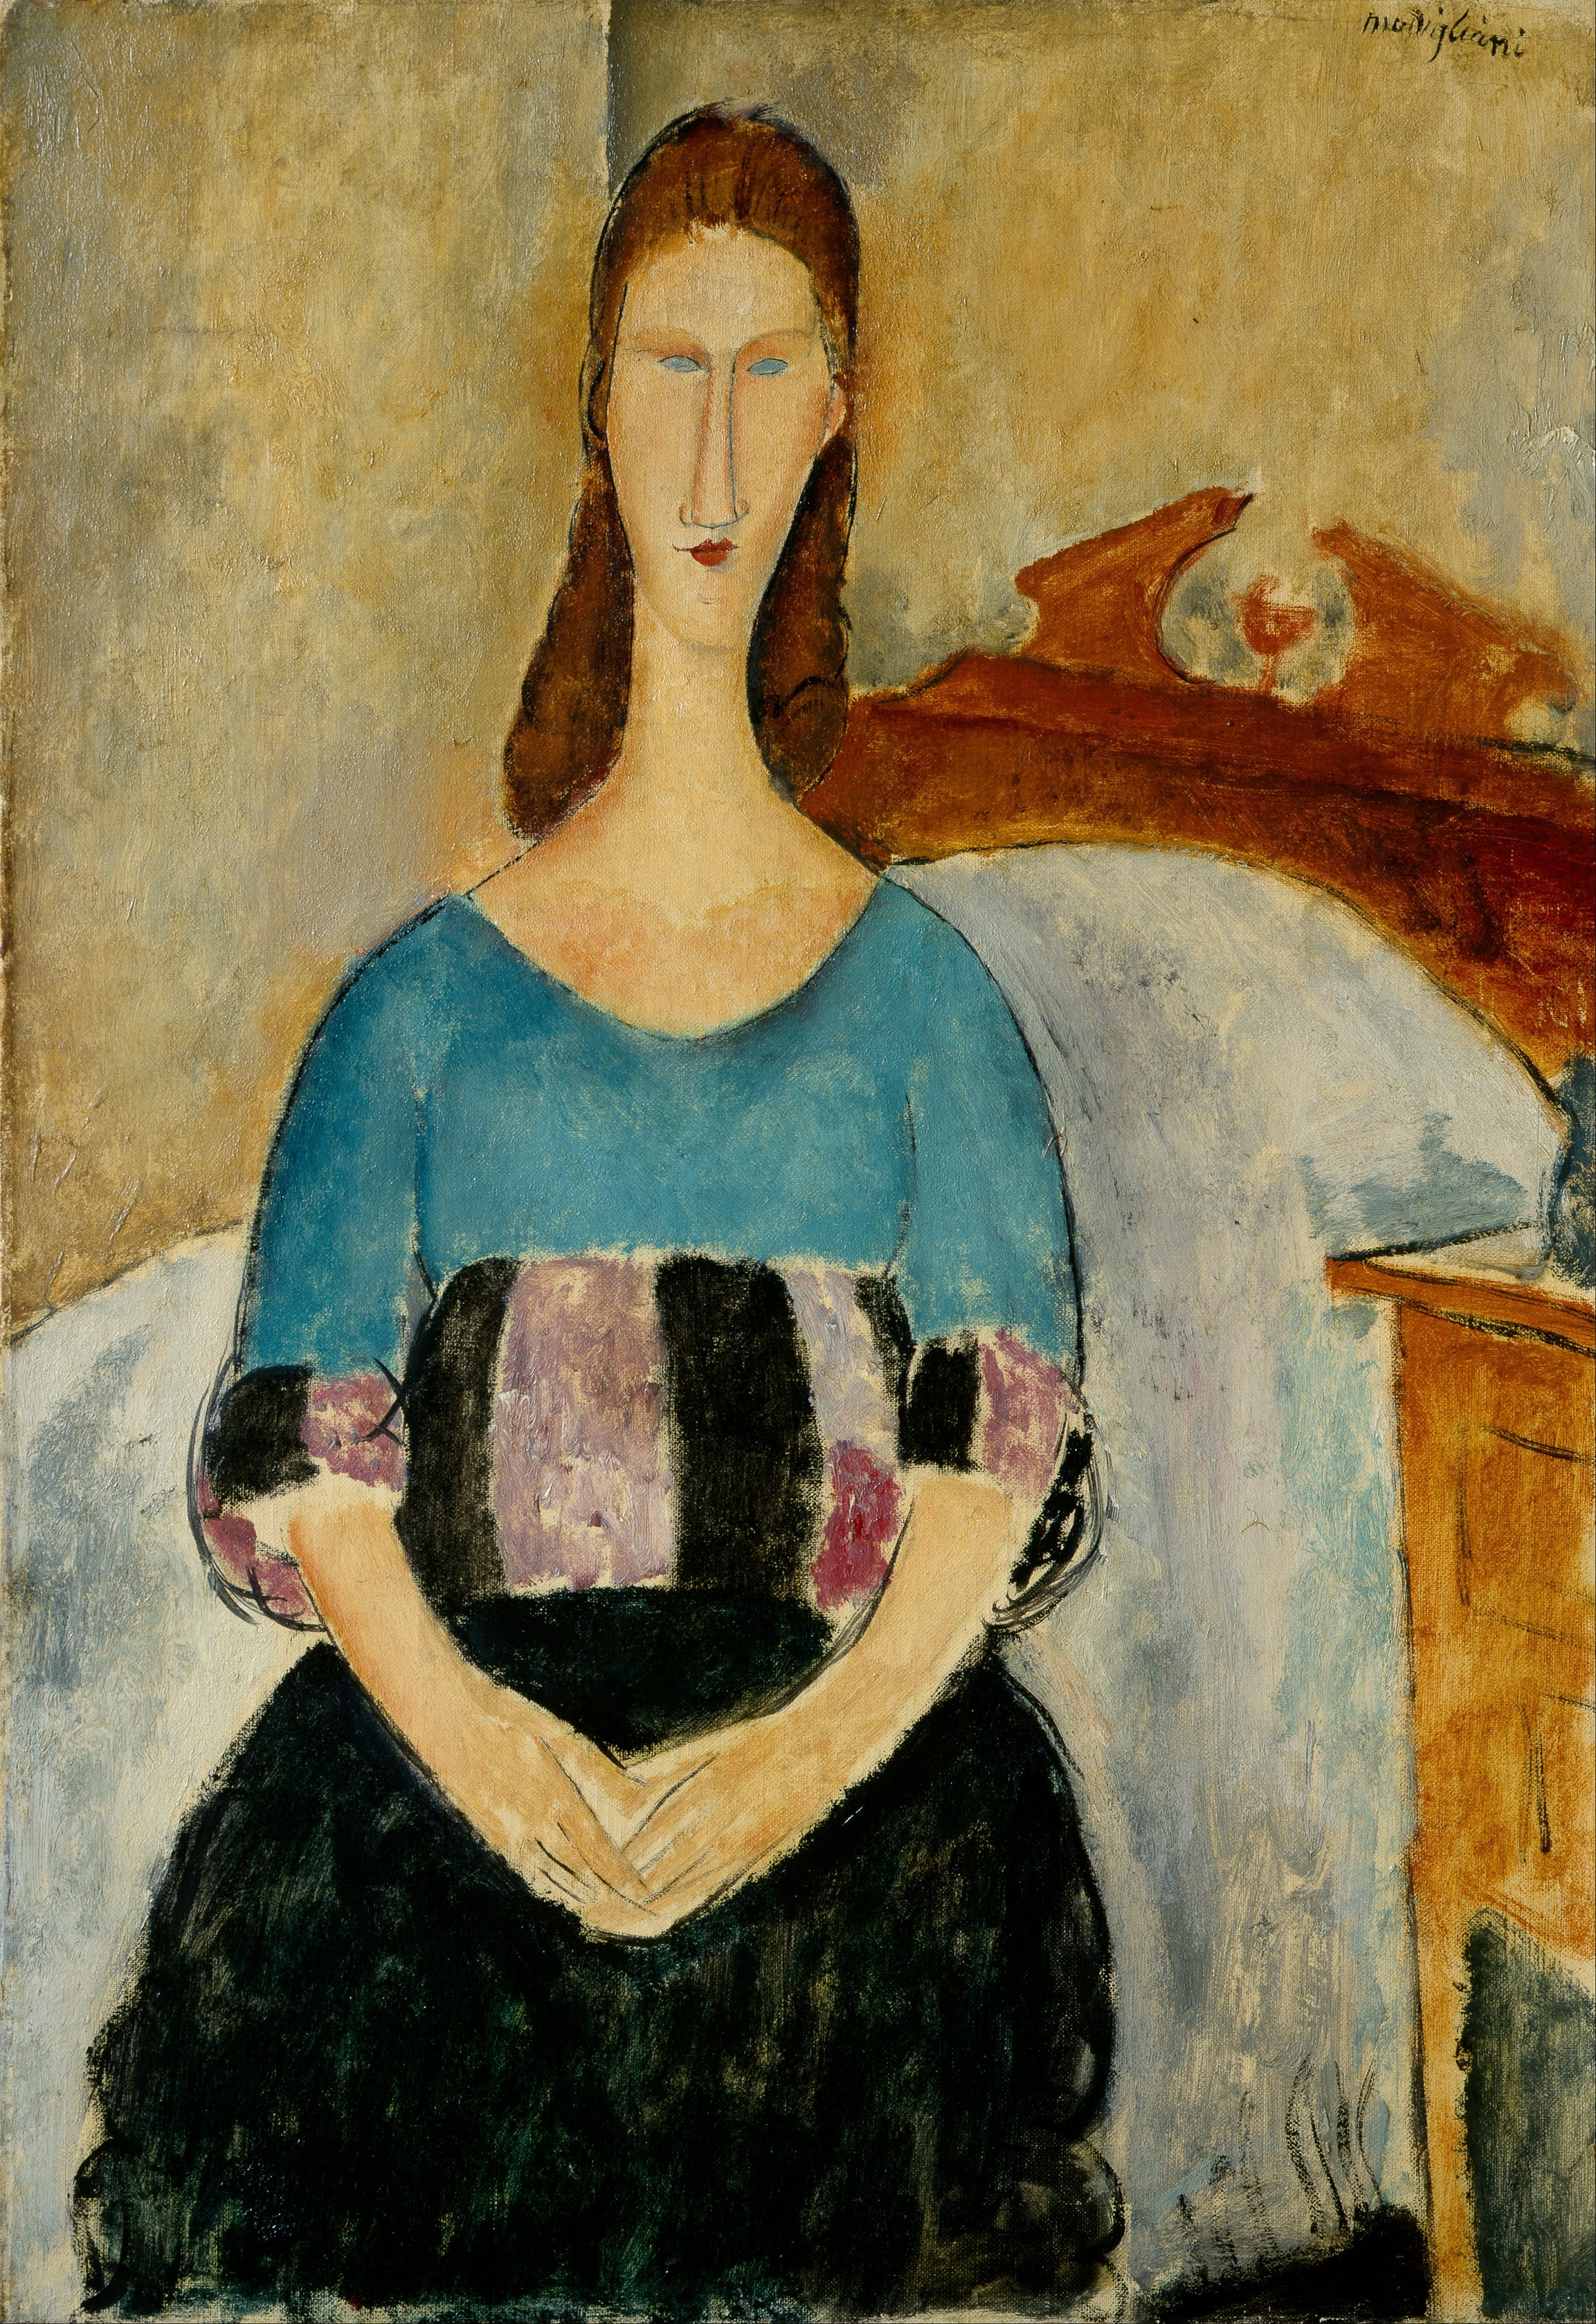 Amedeo Modigliani, 'Portrait of Jeanne, Seated', 1918